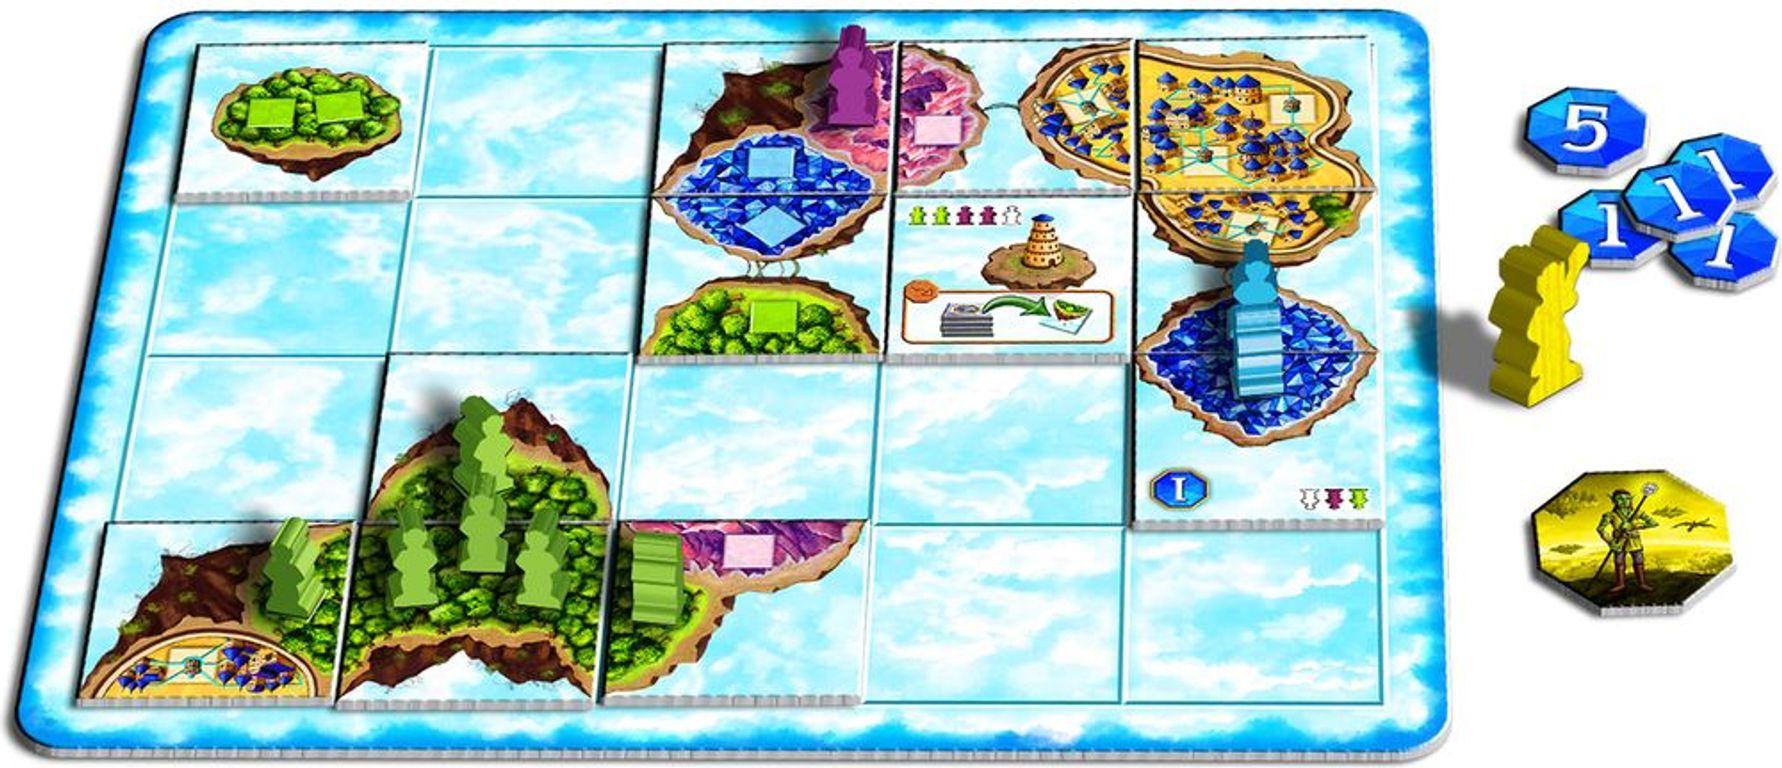 Skylands gameplay